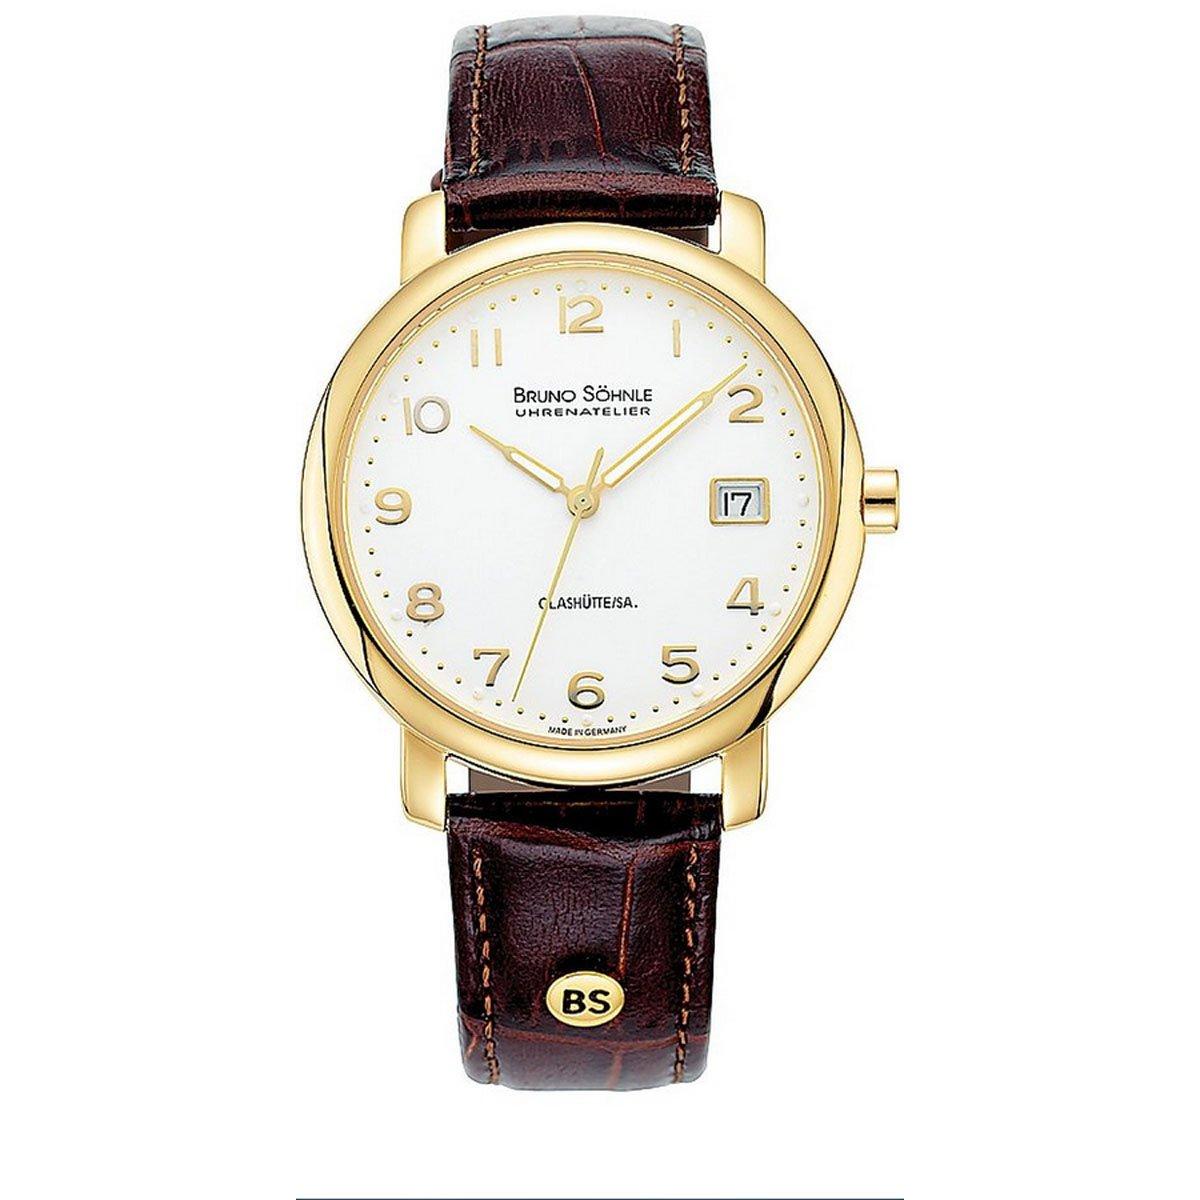 Herren Analog Quarz Uhr mit Leder Armband 17-33016-941